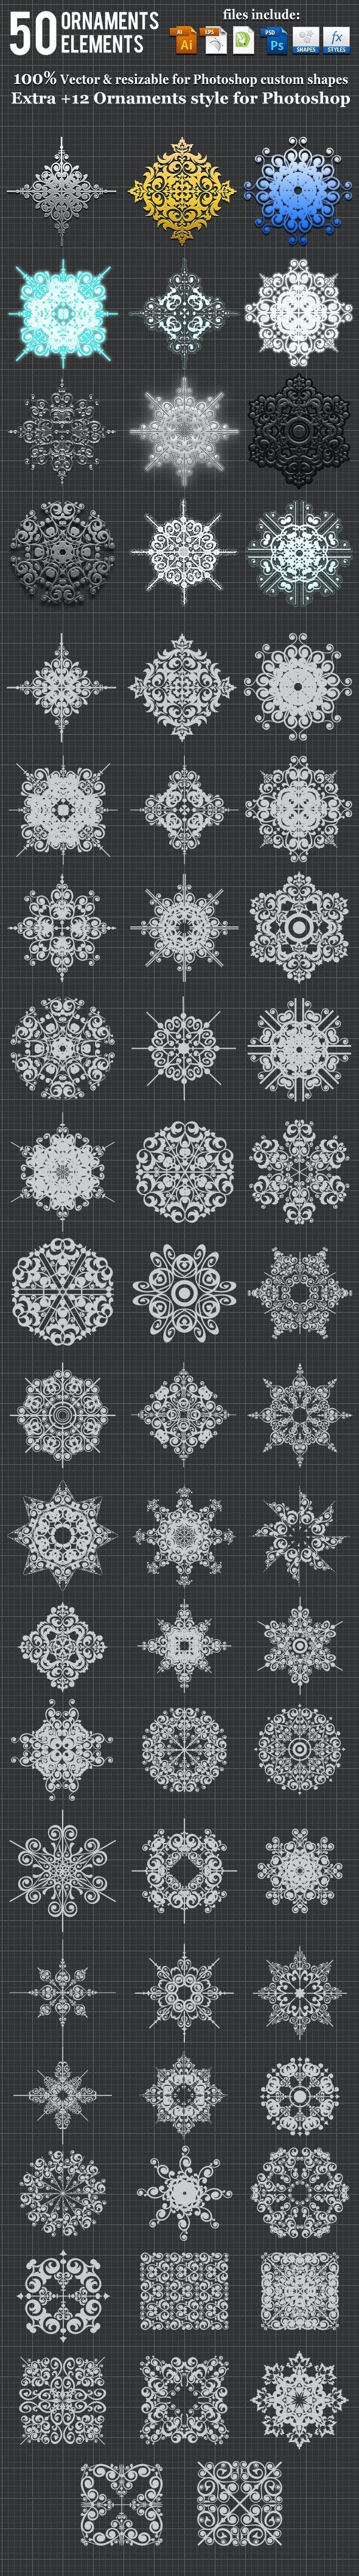 50 Ornaments Element Photoshop Custom Shape - Miscellaneous Shapes